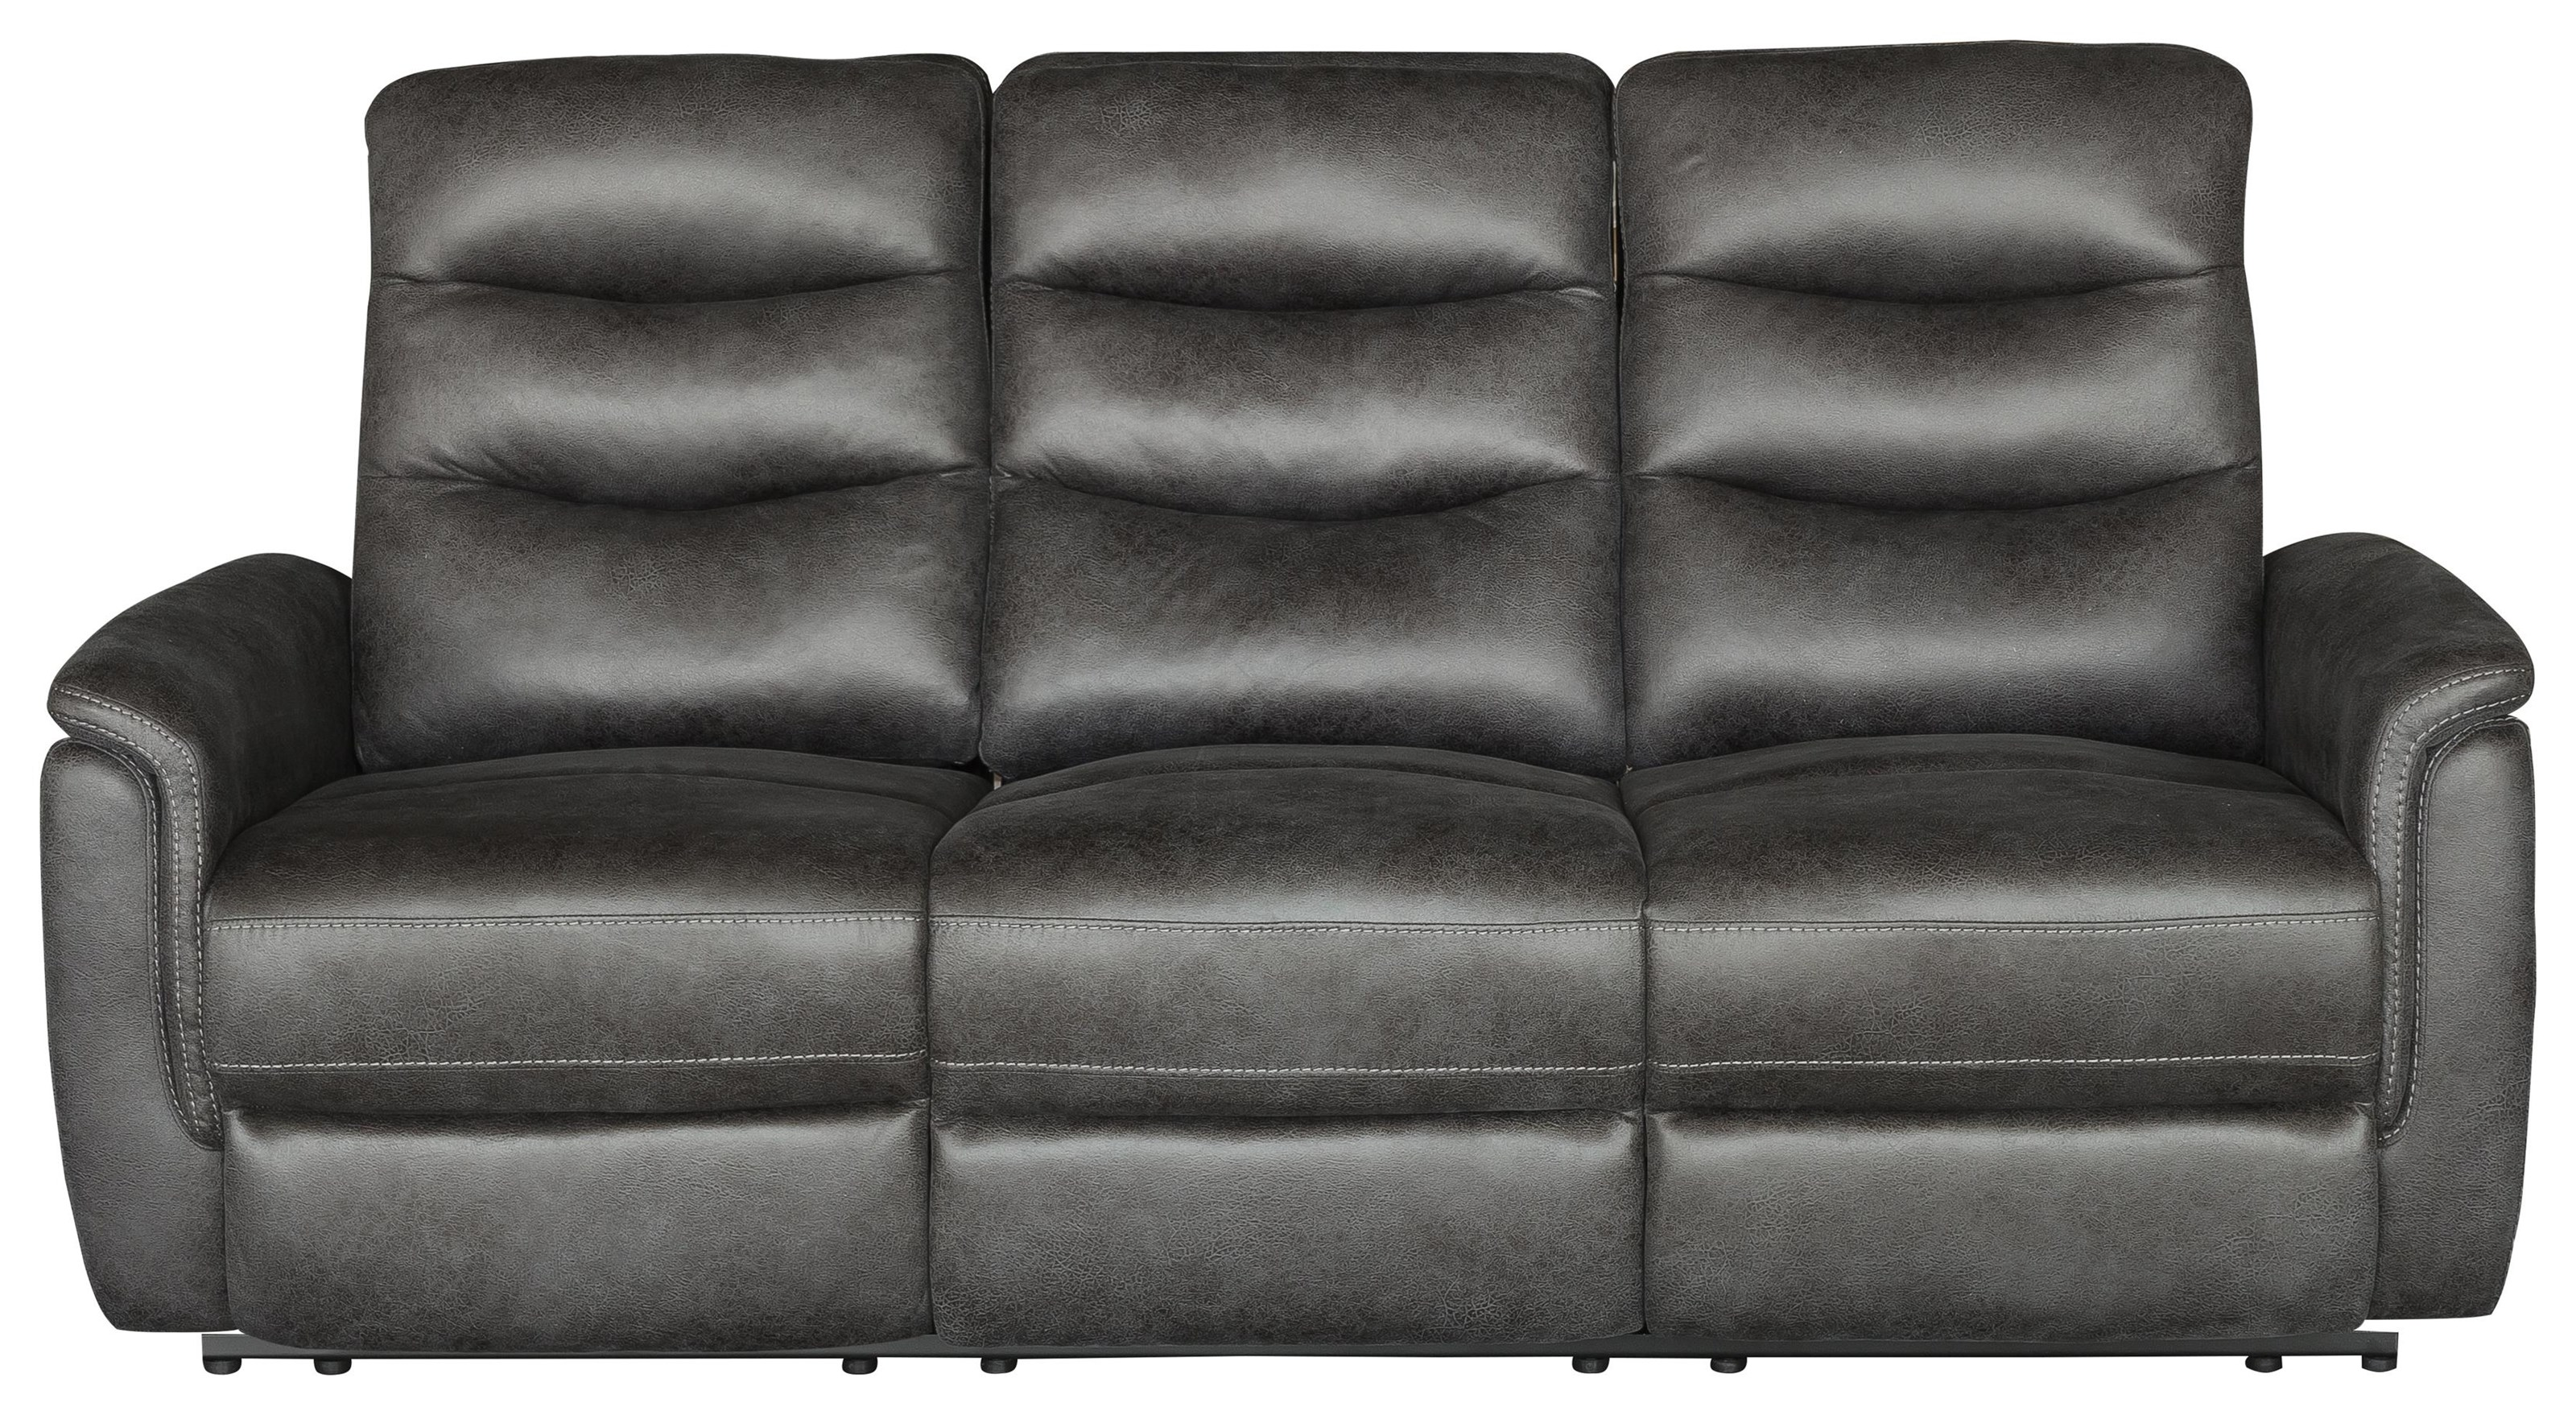 Graham Power Reclining Sofa by Klaussner International at HomeWorld Furniture